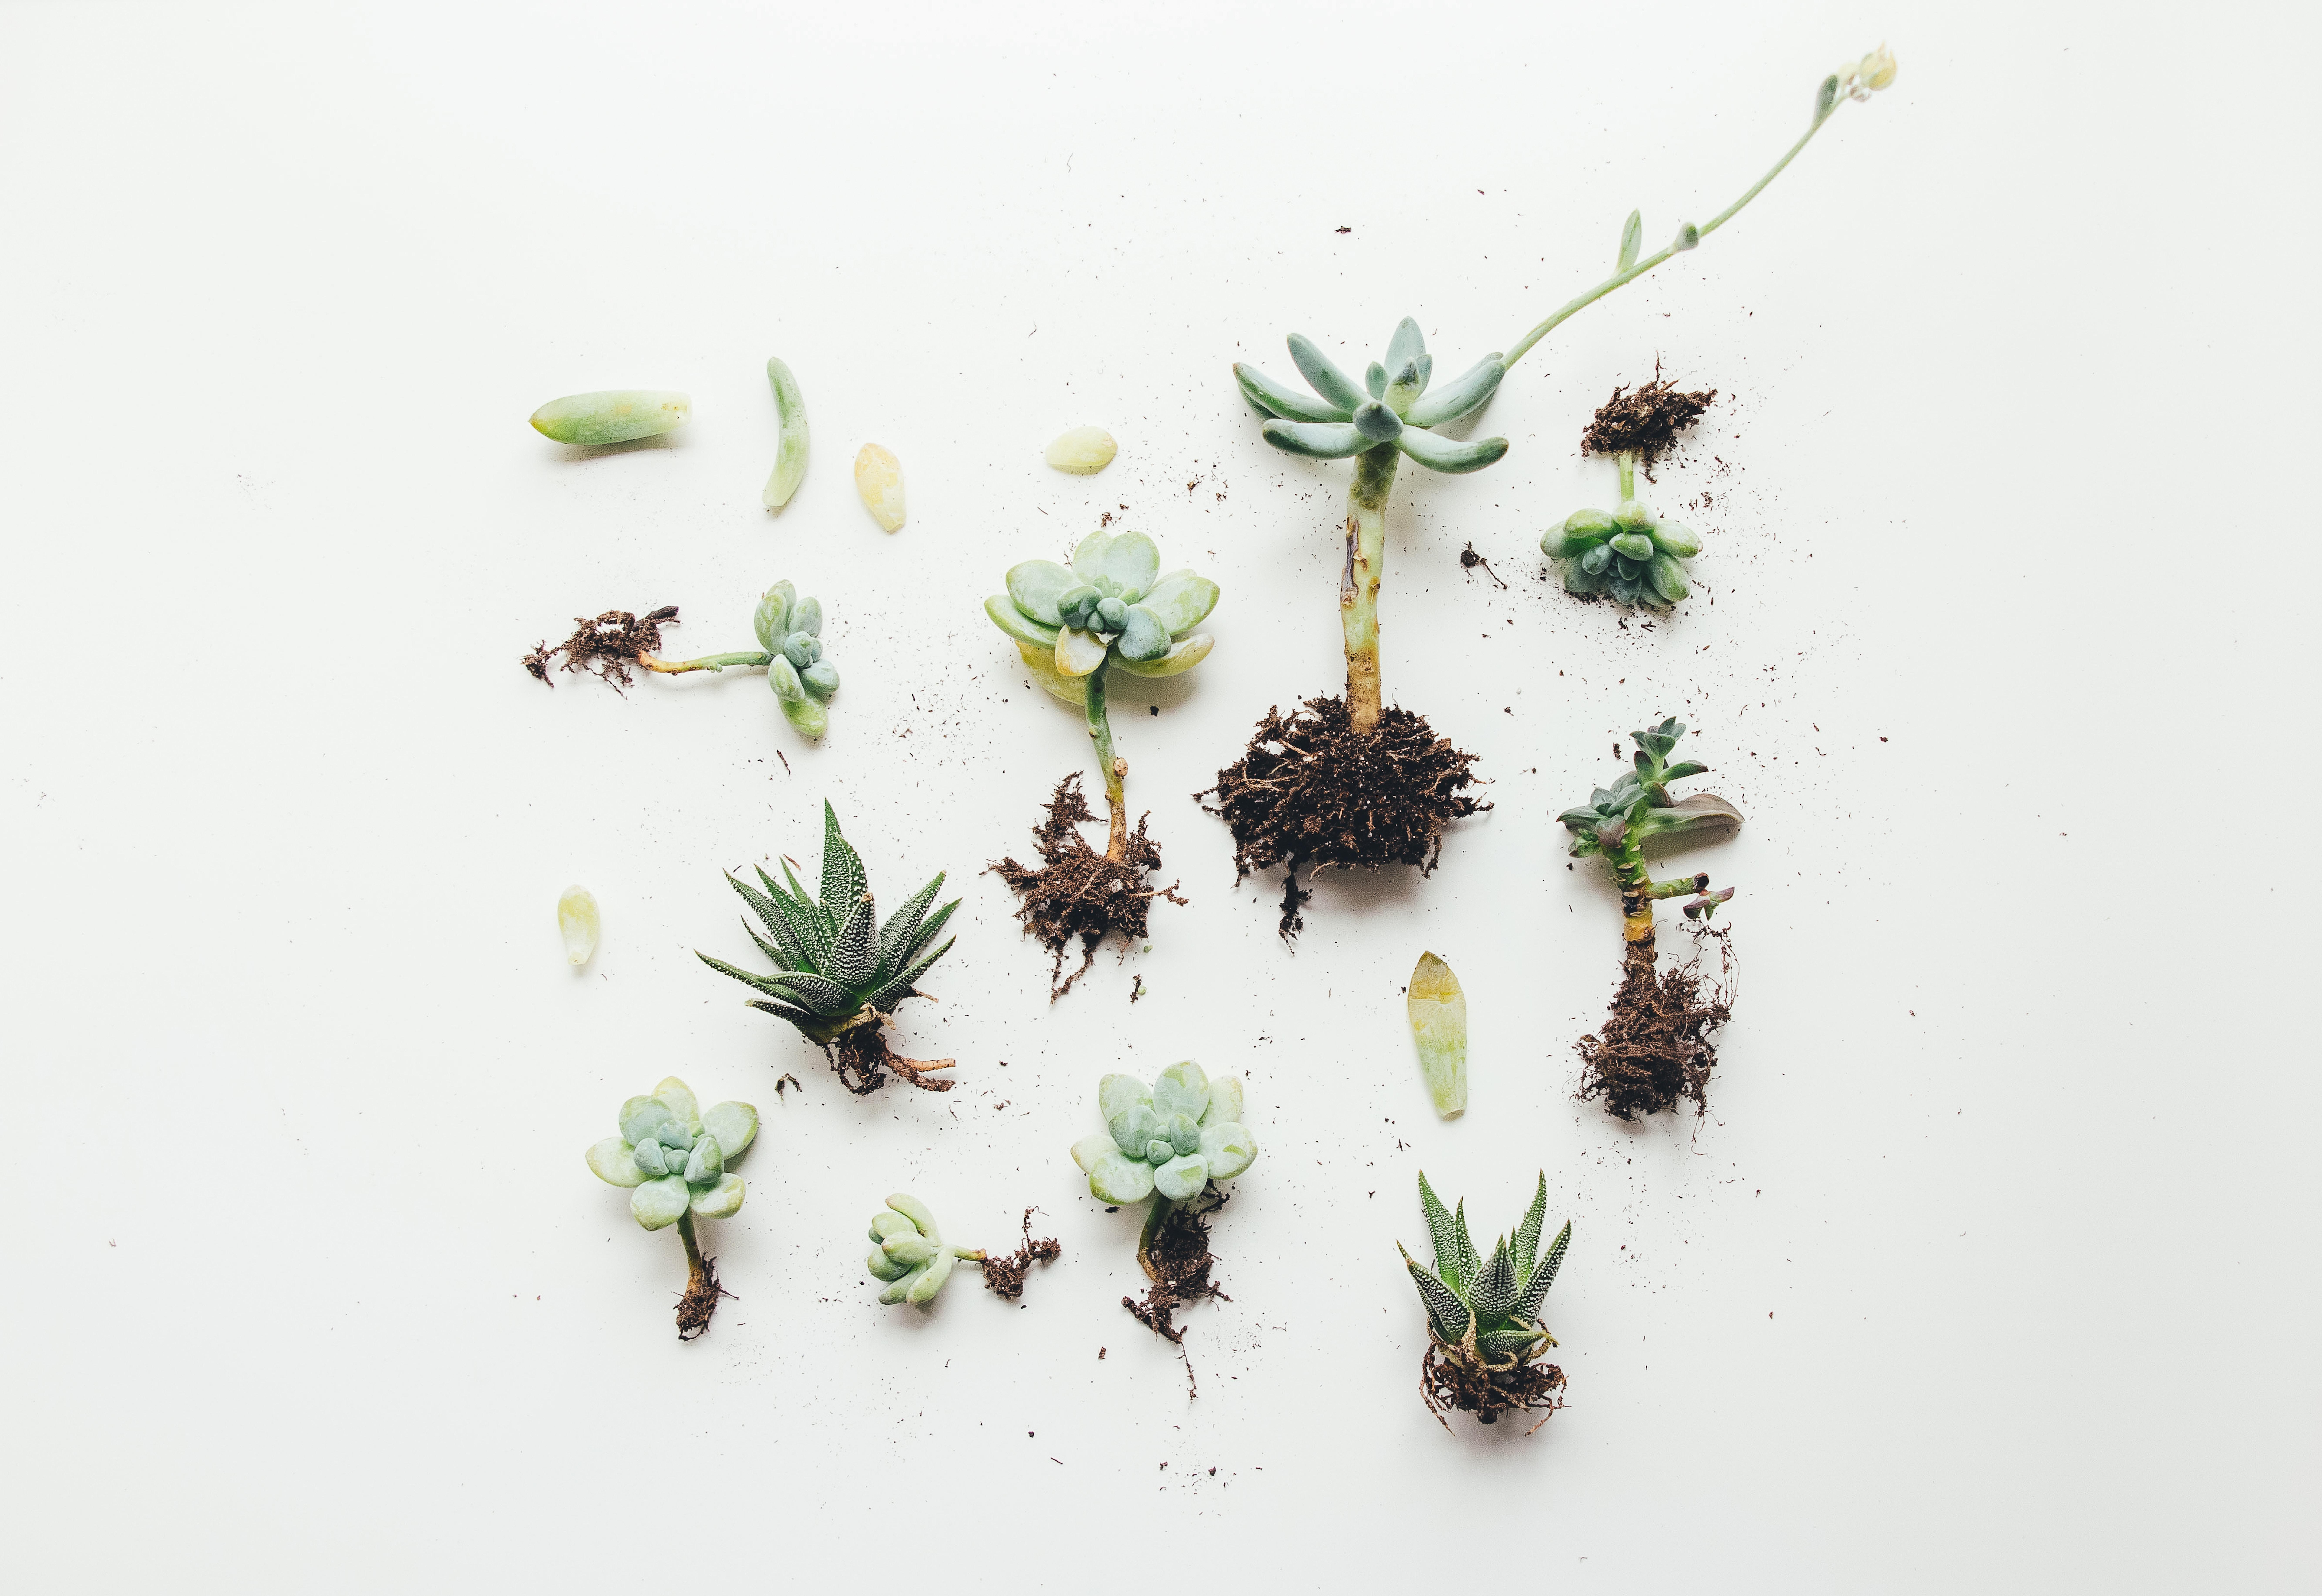 http://images.unsplash.com/photo-1488645411773-a3b09ea07e29?dpr=2.222222328186035&auto=format&fit=crop&w=1500&h=1031&q=80&cs=tinysrgb&crop=